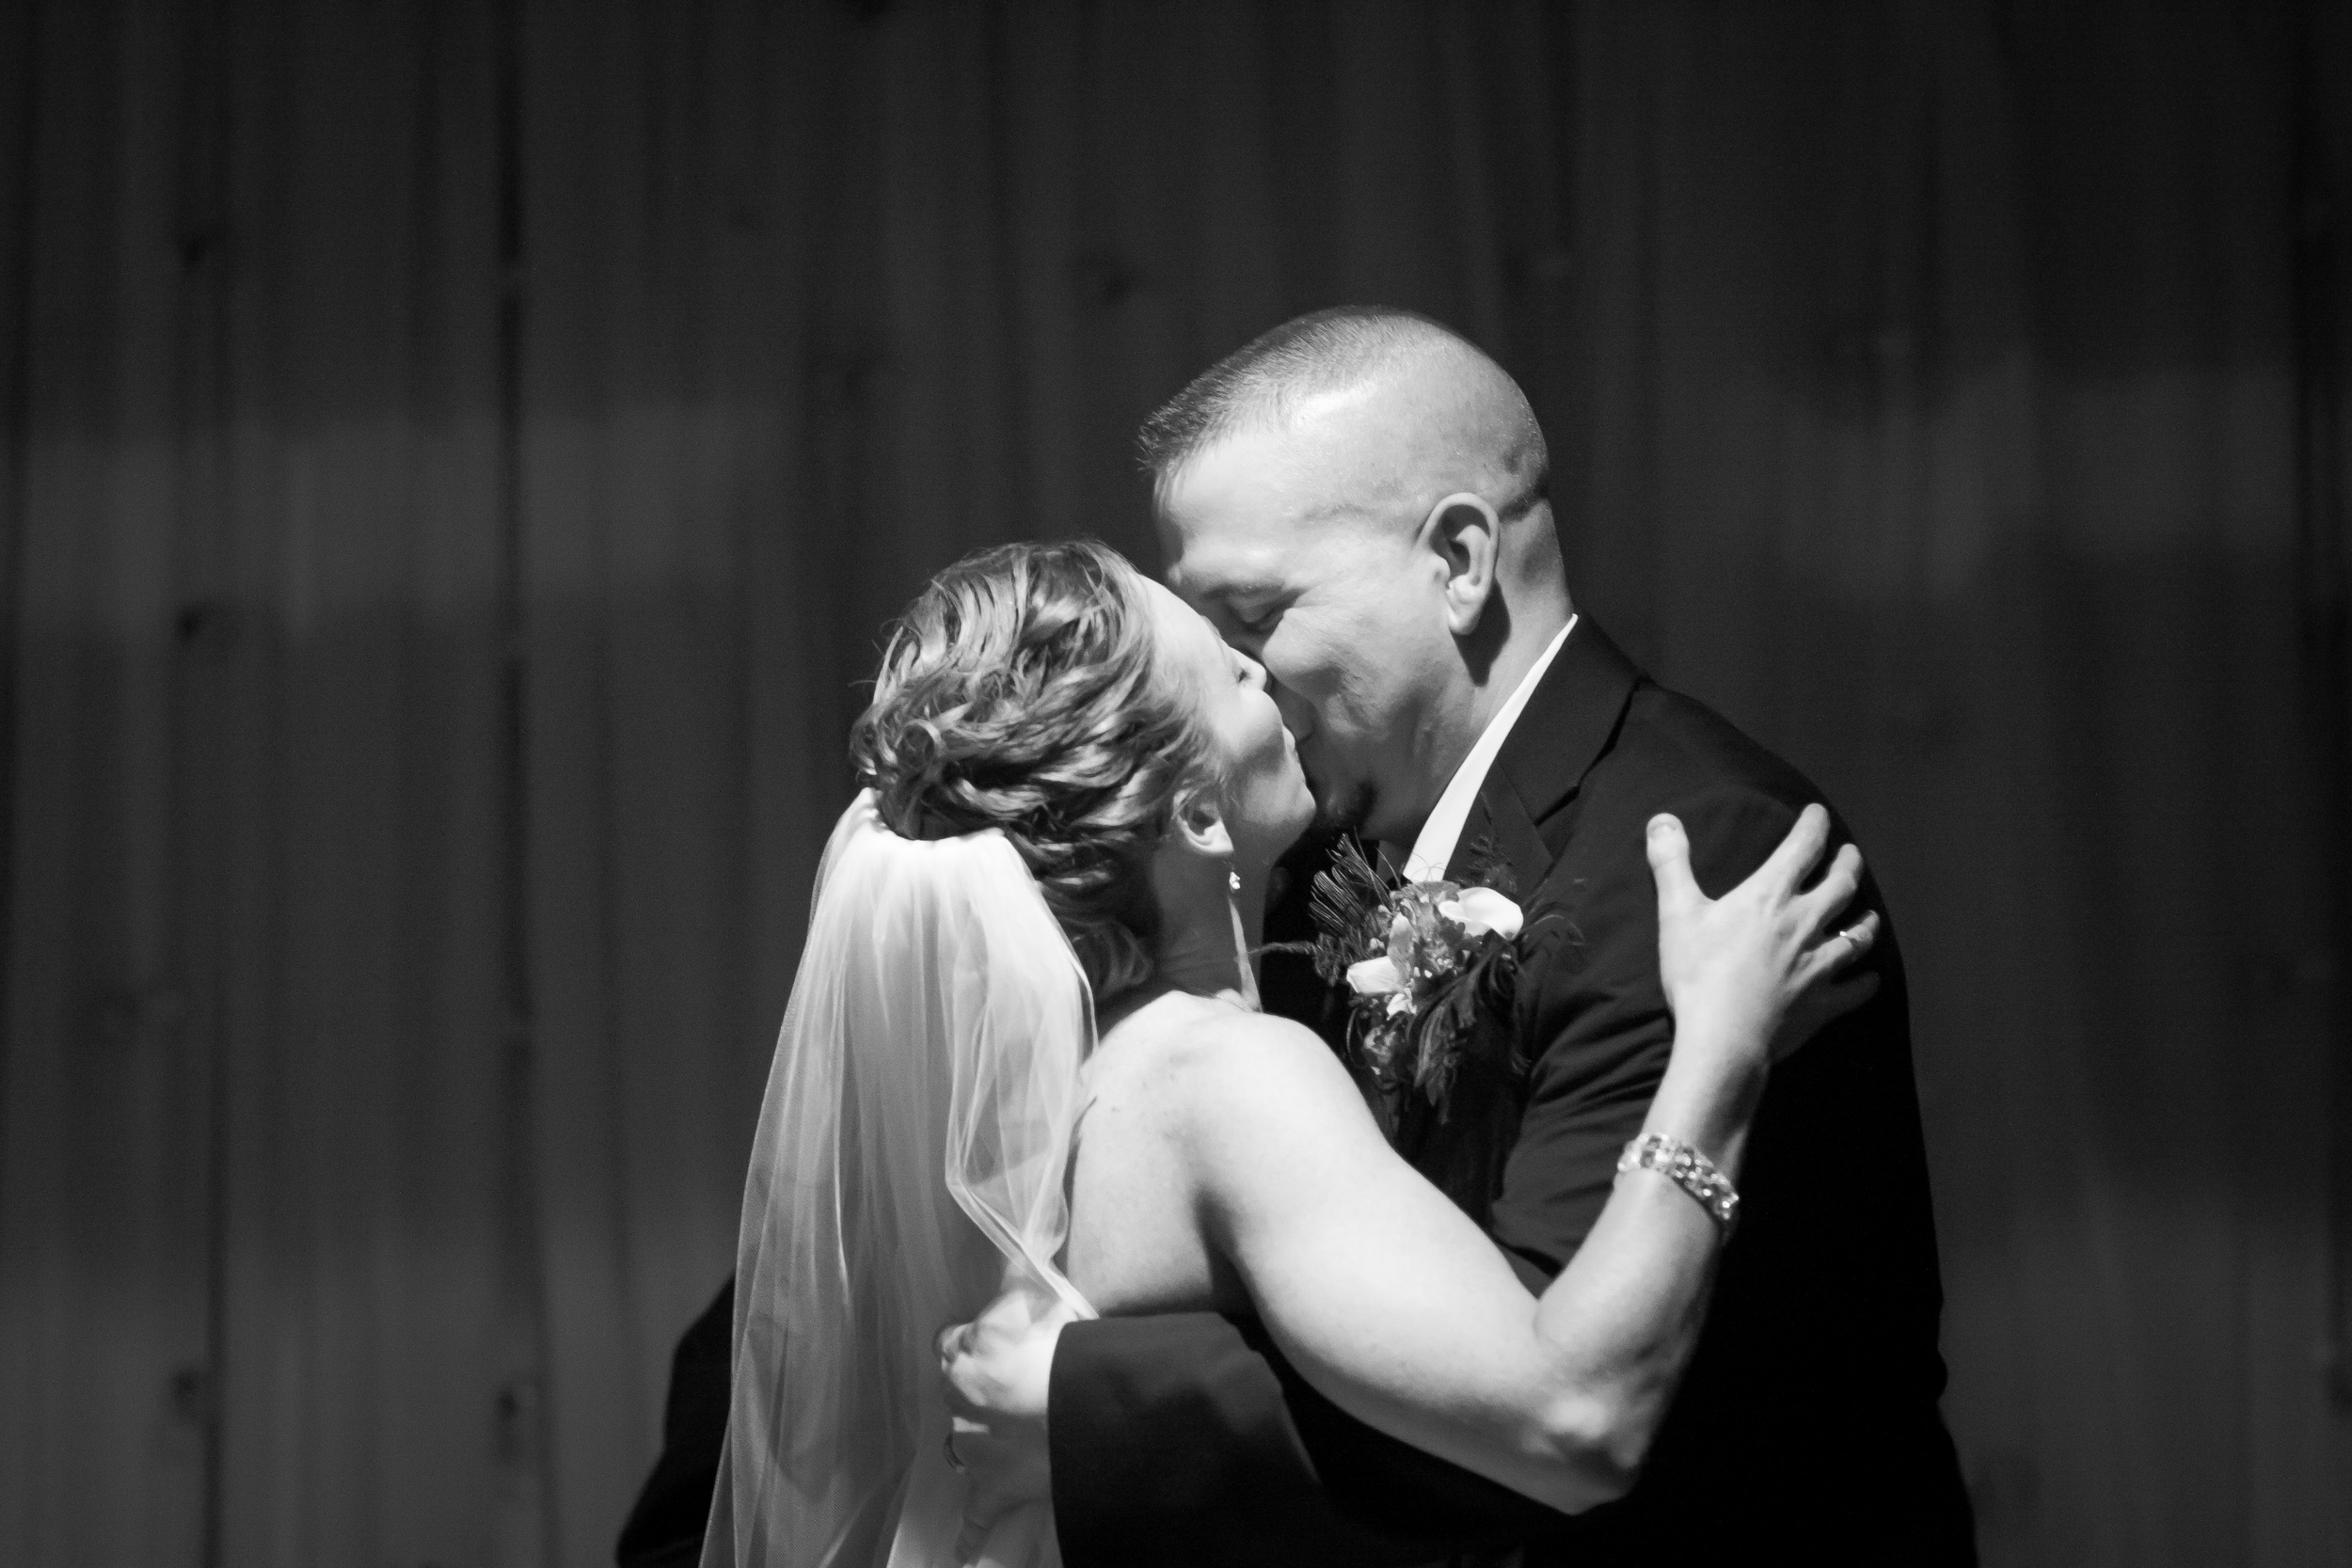 The kyle house wedding blacksburg wedding photographer bent-lee carr photography first kiss